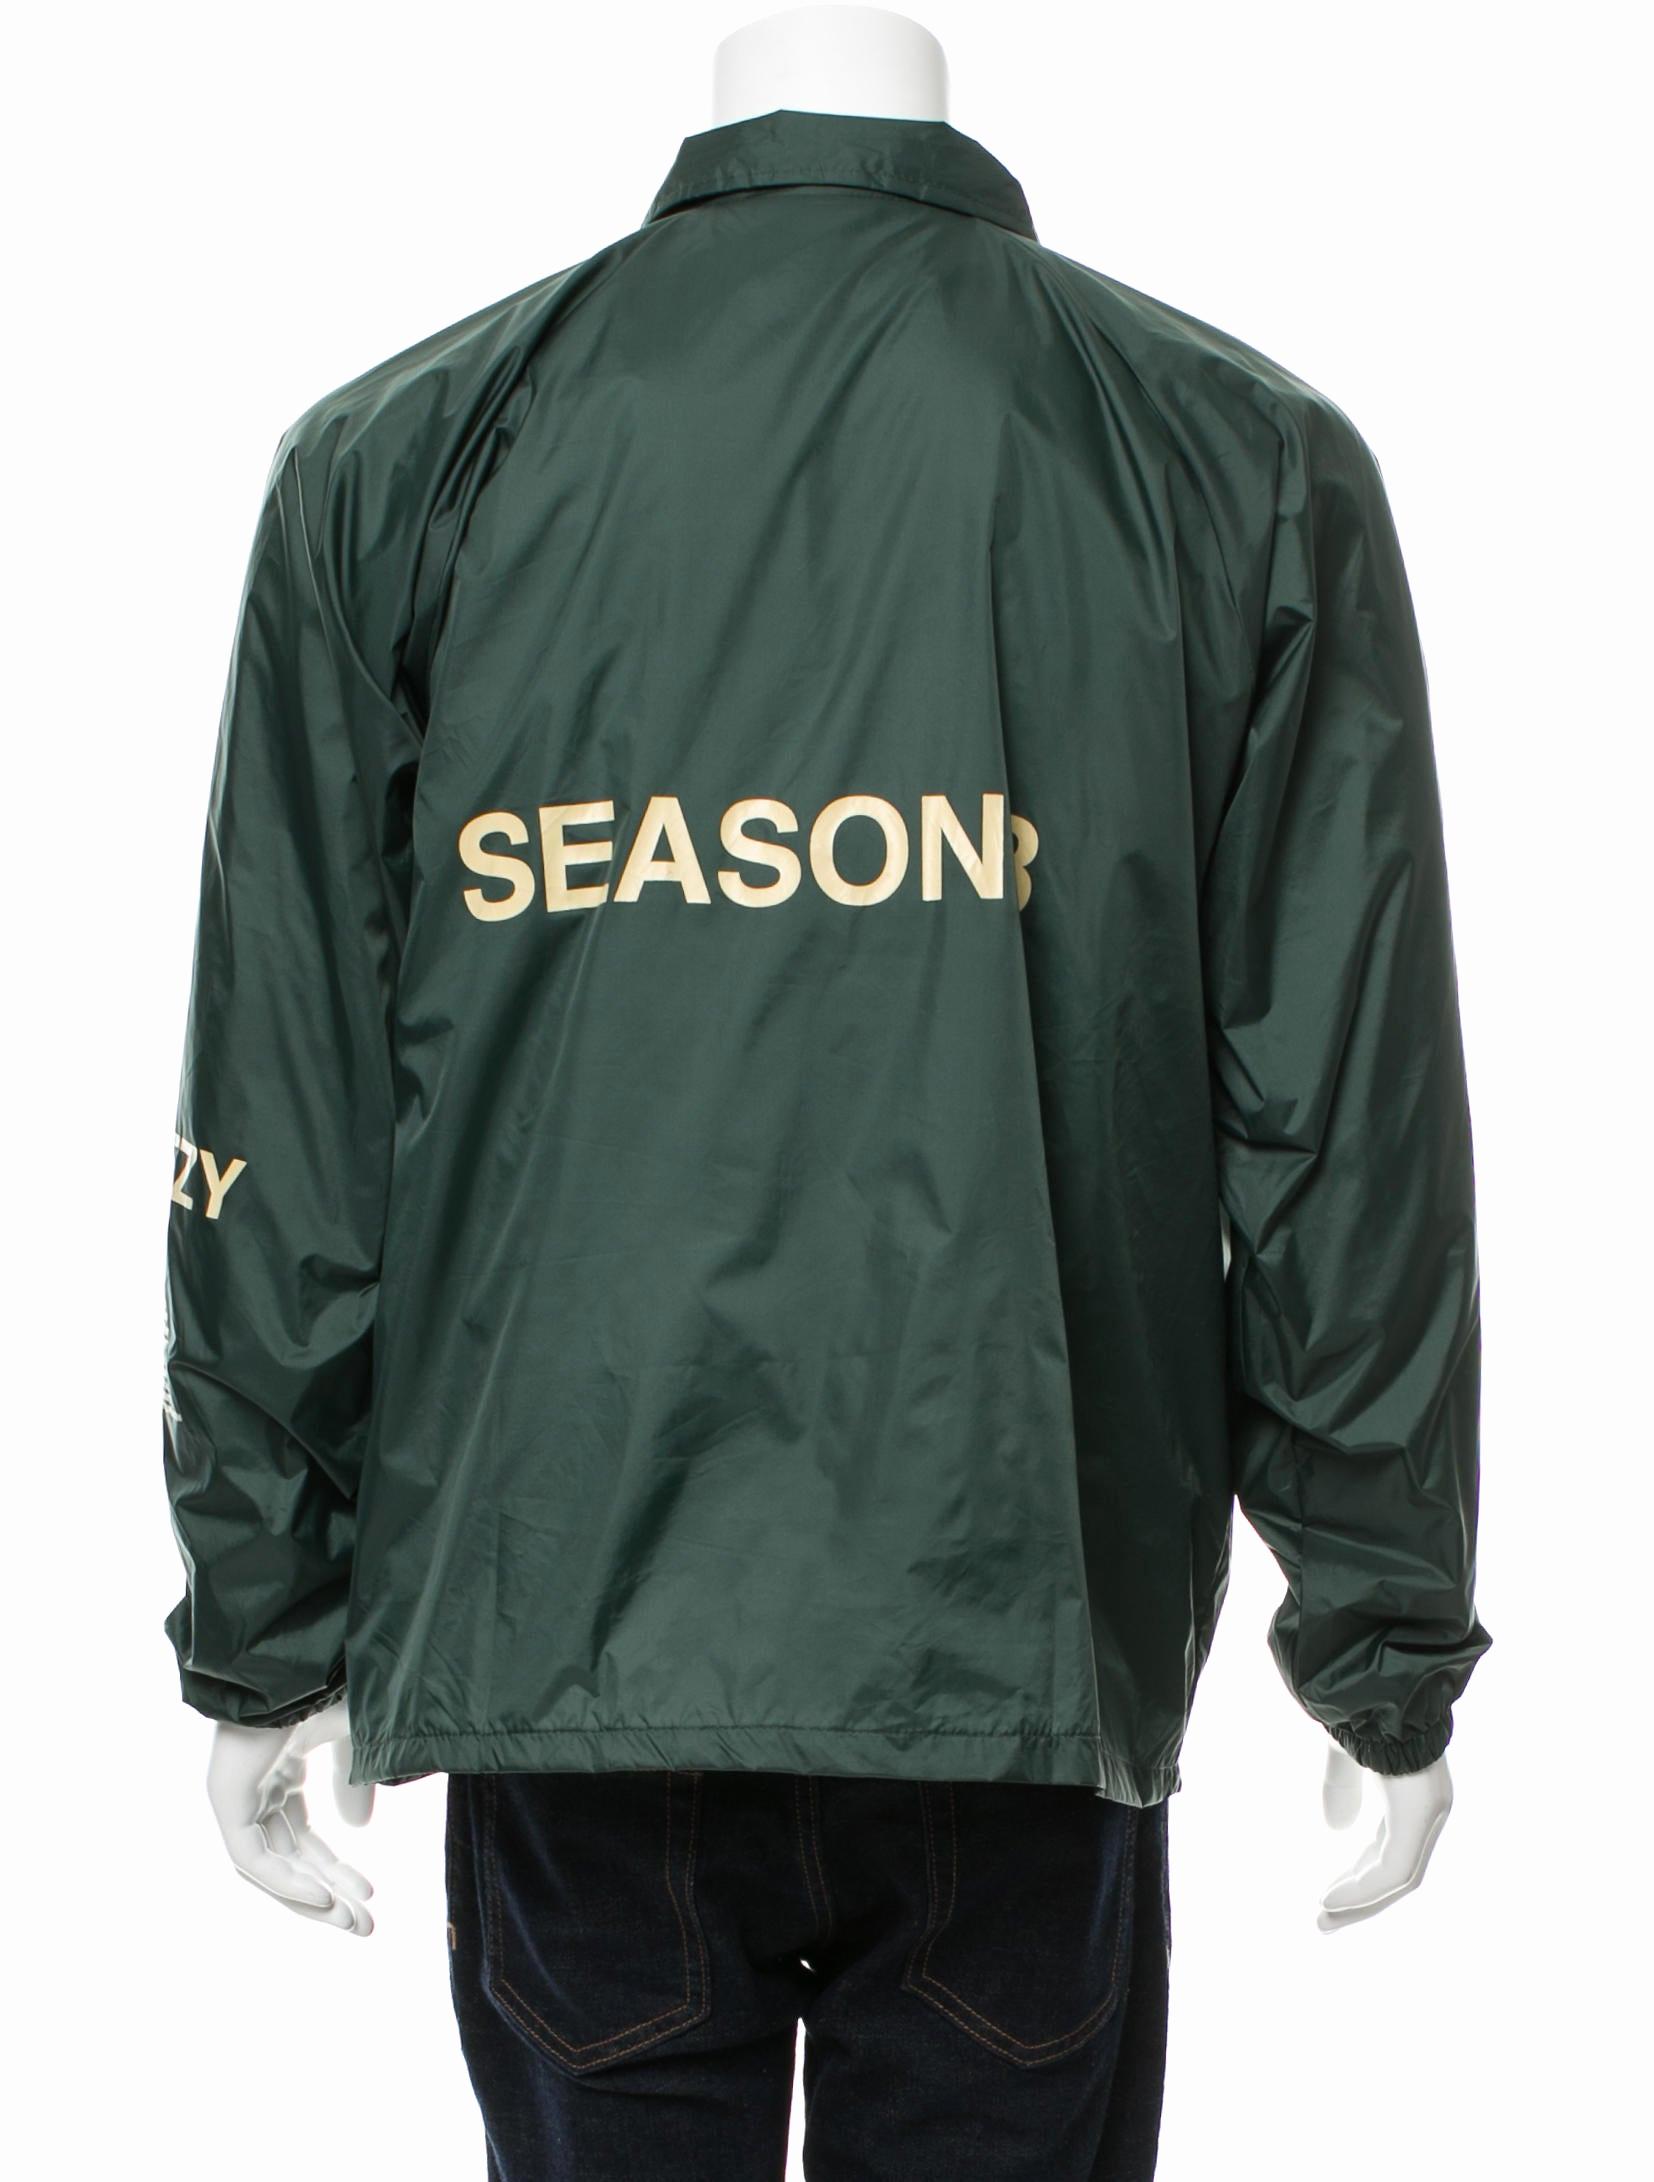 Yeezy Invitation 3 Windbreaker Beautiful Yeezy Season 3 Invitation Coaches Jacket Clothing